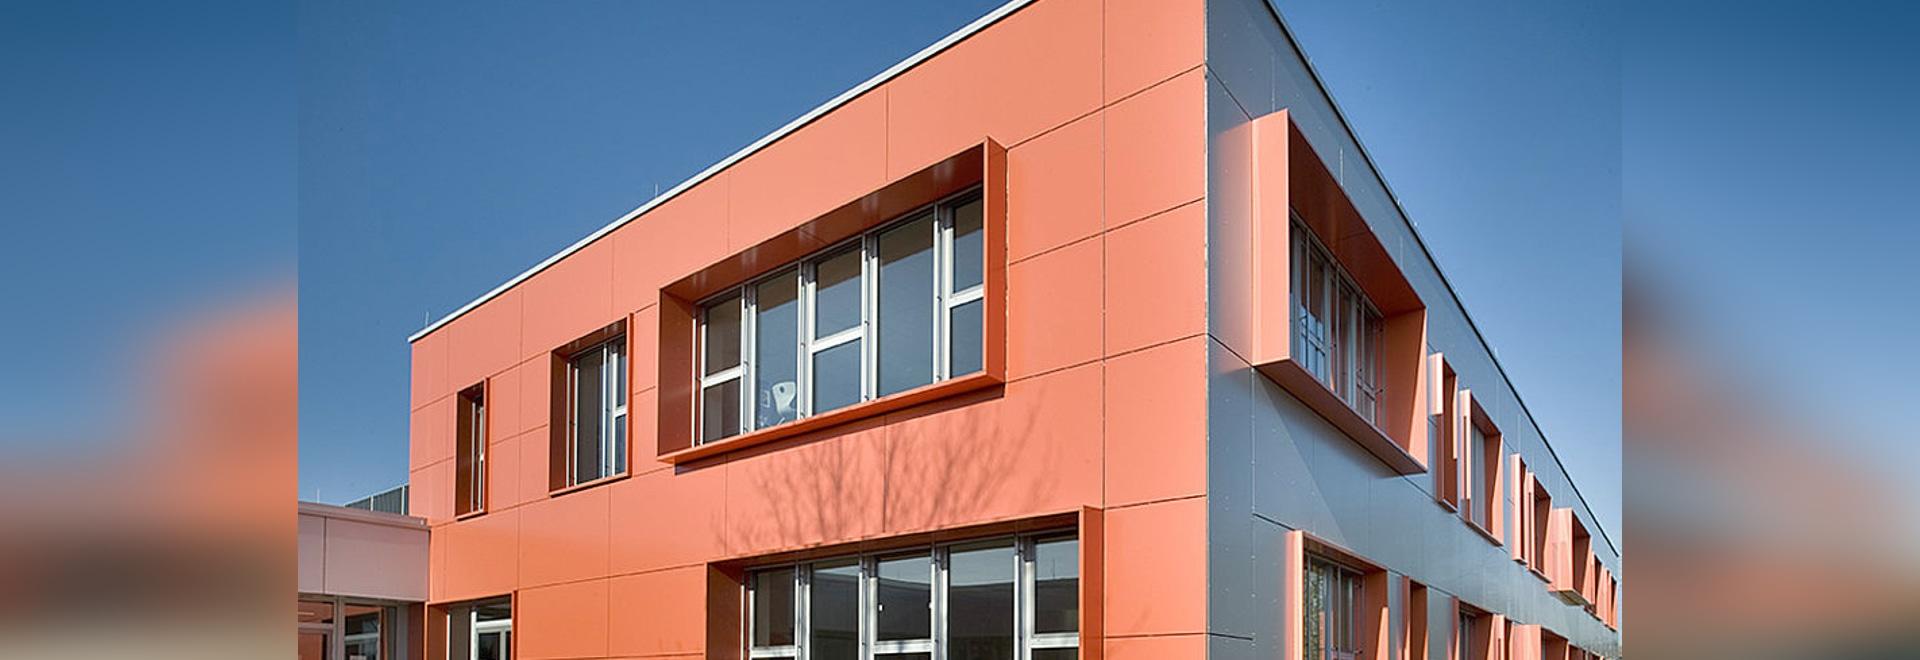 College Wilhelm Leuschner - Energetic and visual renovation with Reynobond aluminium composite panels